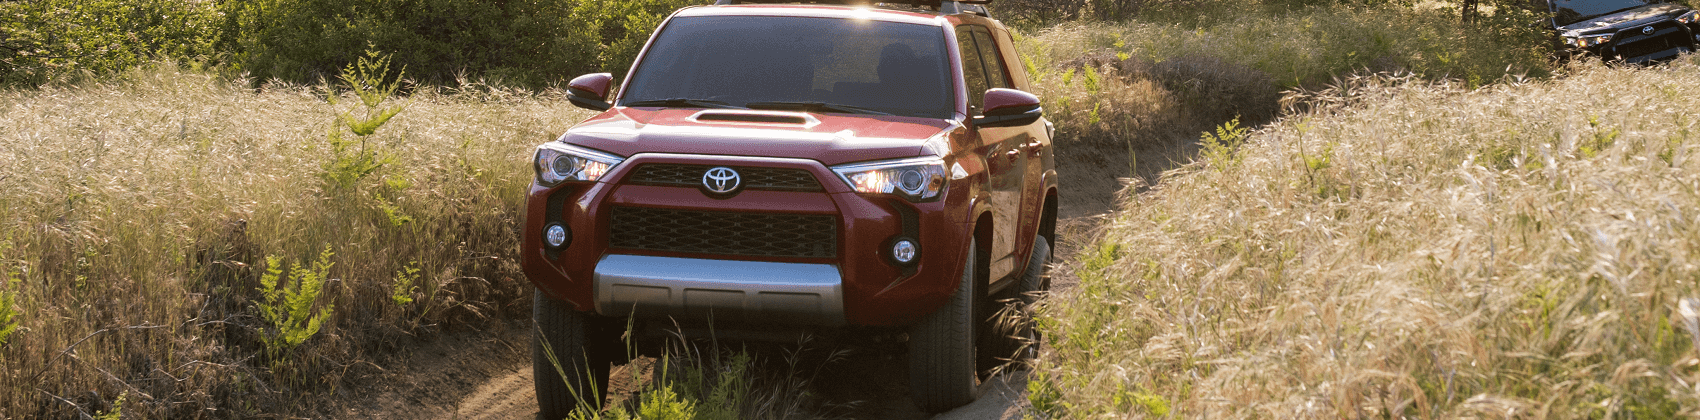 2019 Toyota 4Runner Off-Road